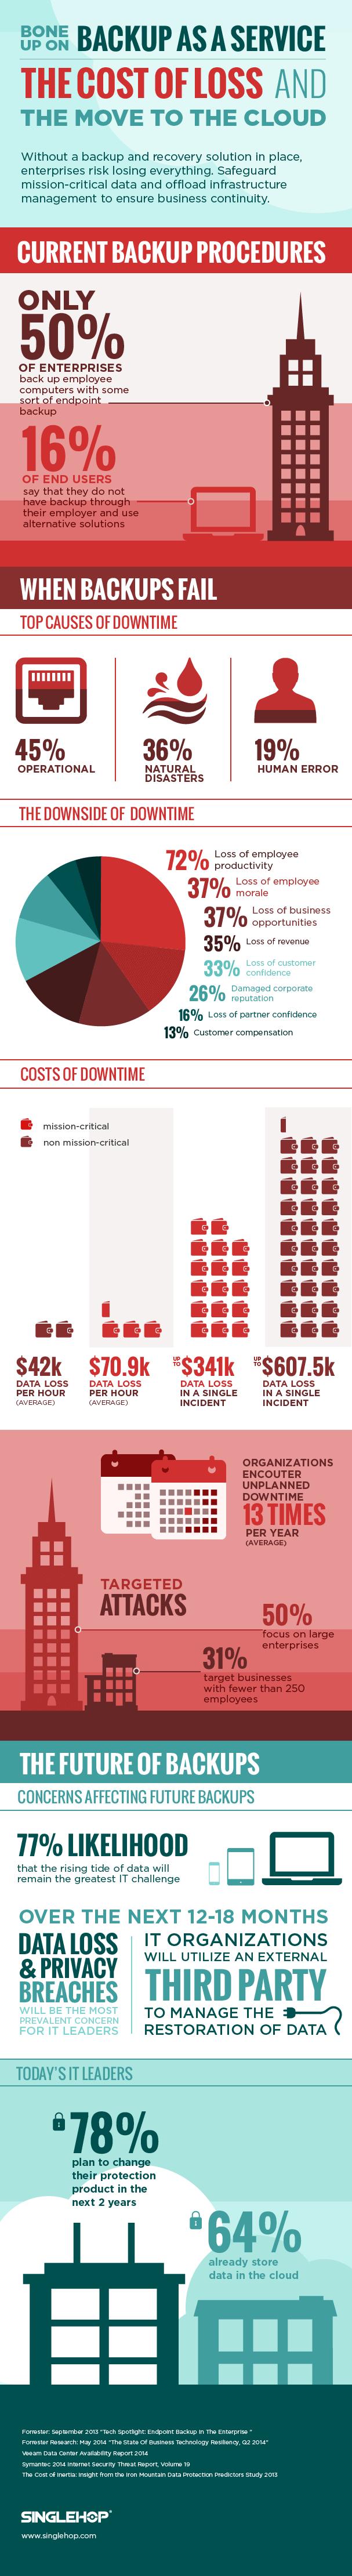 SingleHop_BaaS_Infographic